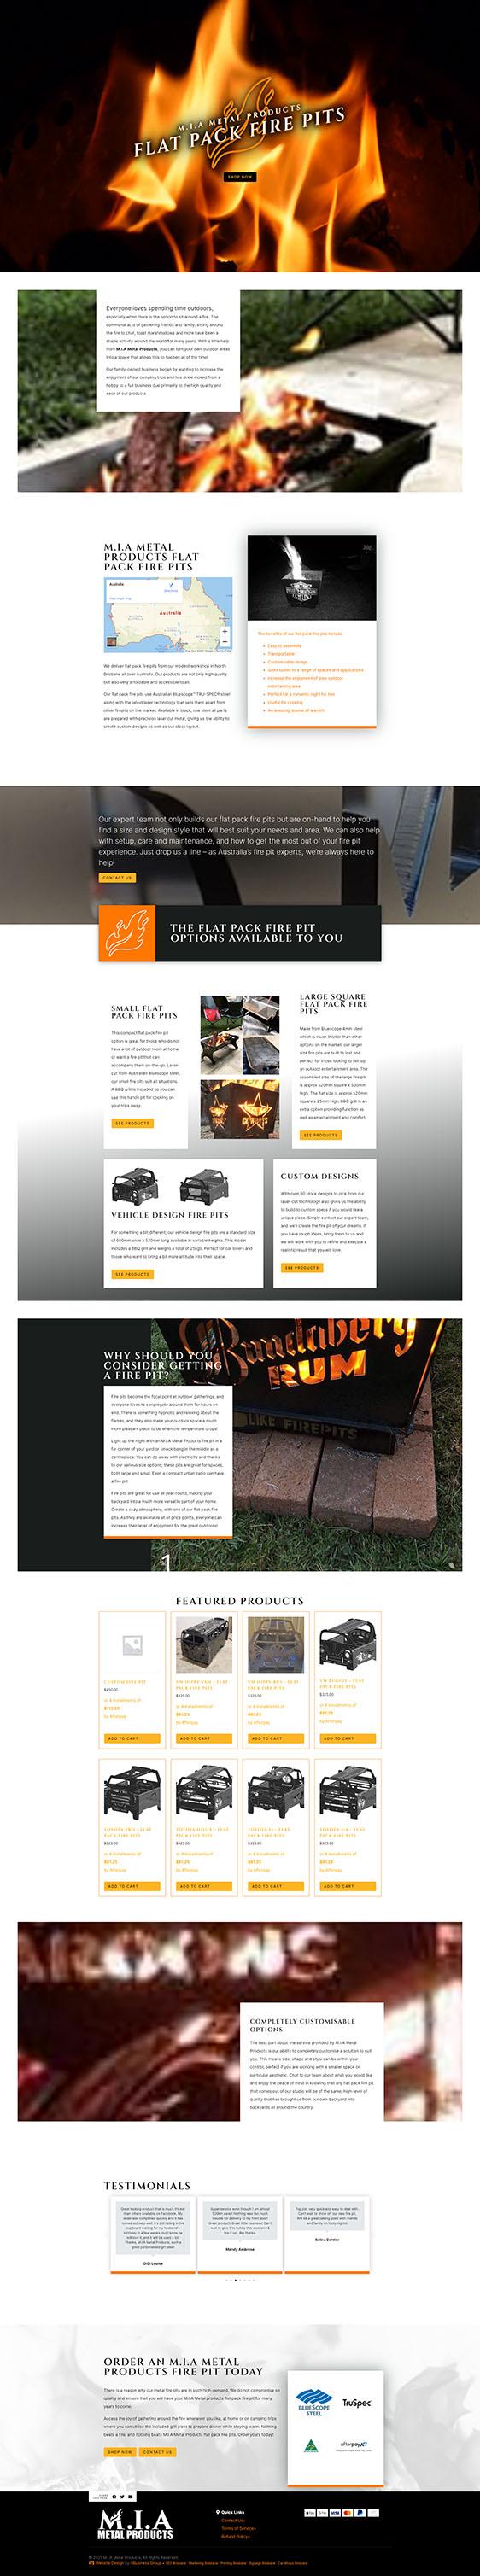 MIA Metal Products: Desktop View